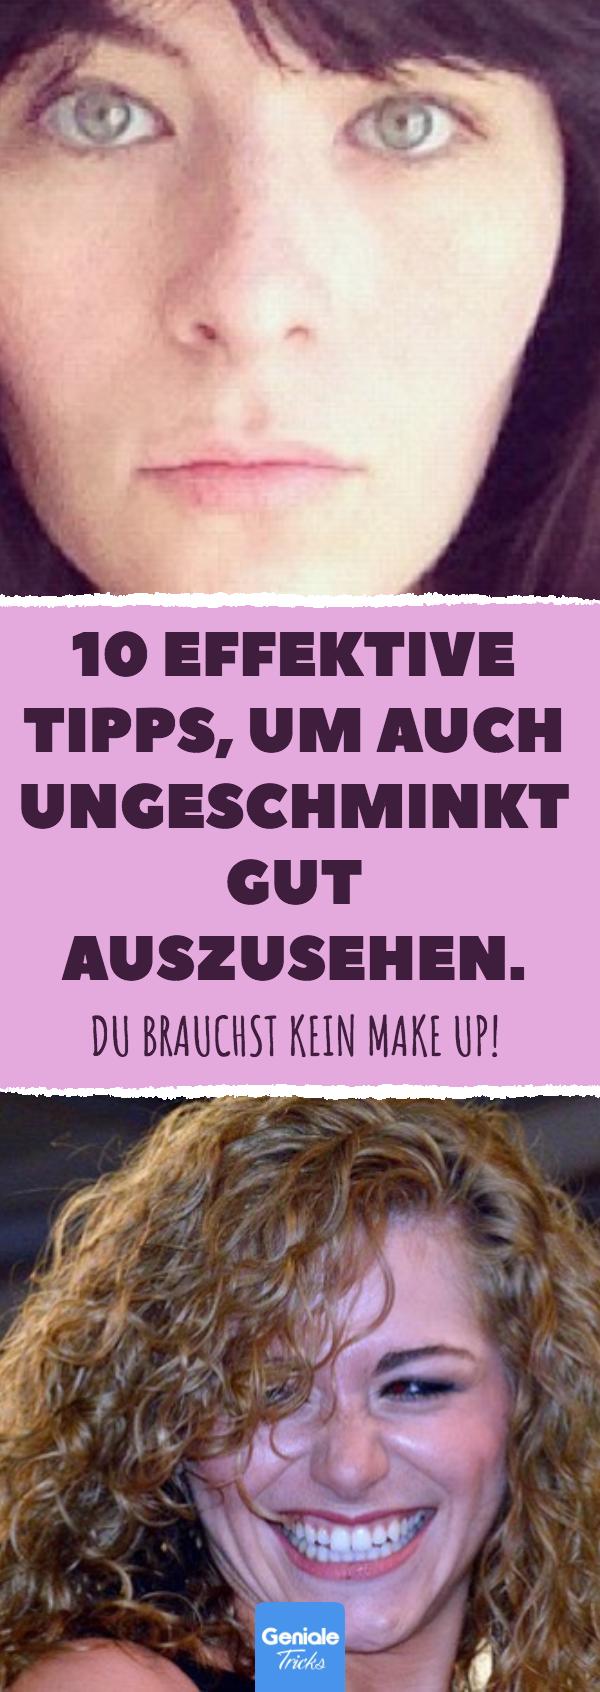 10 effektive Tipps, um auch ungeschminkt gut auszusehen.